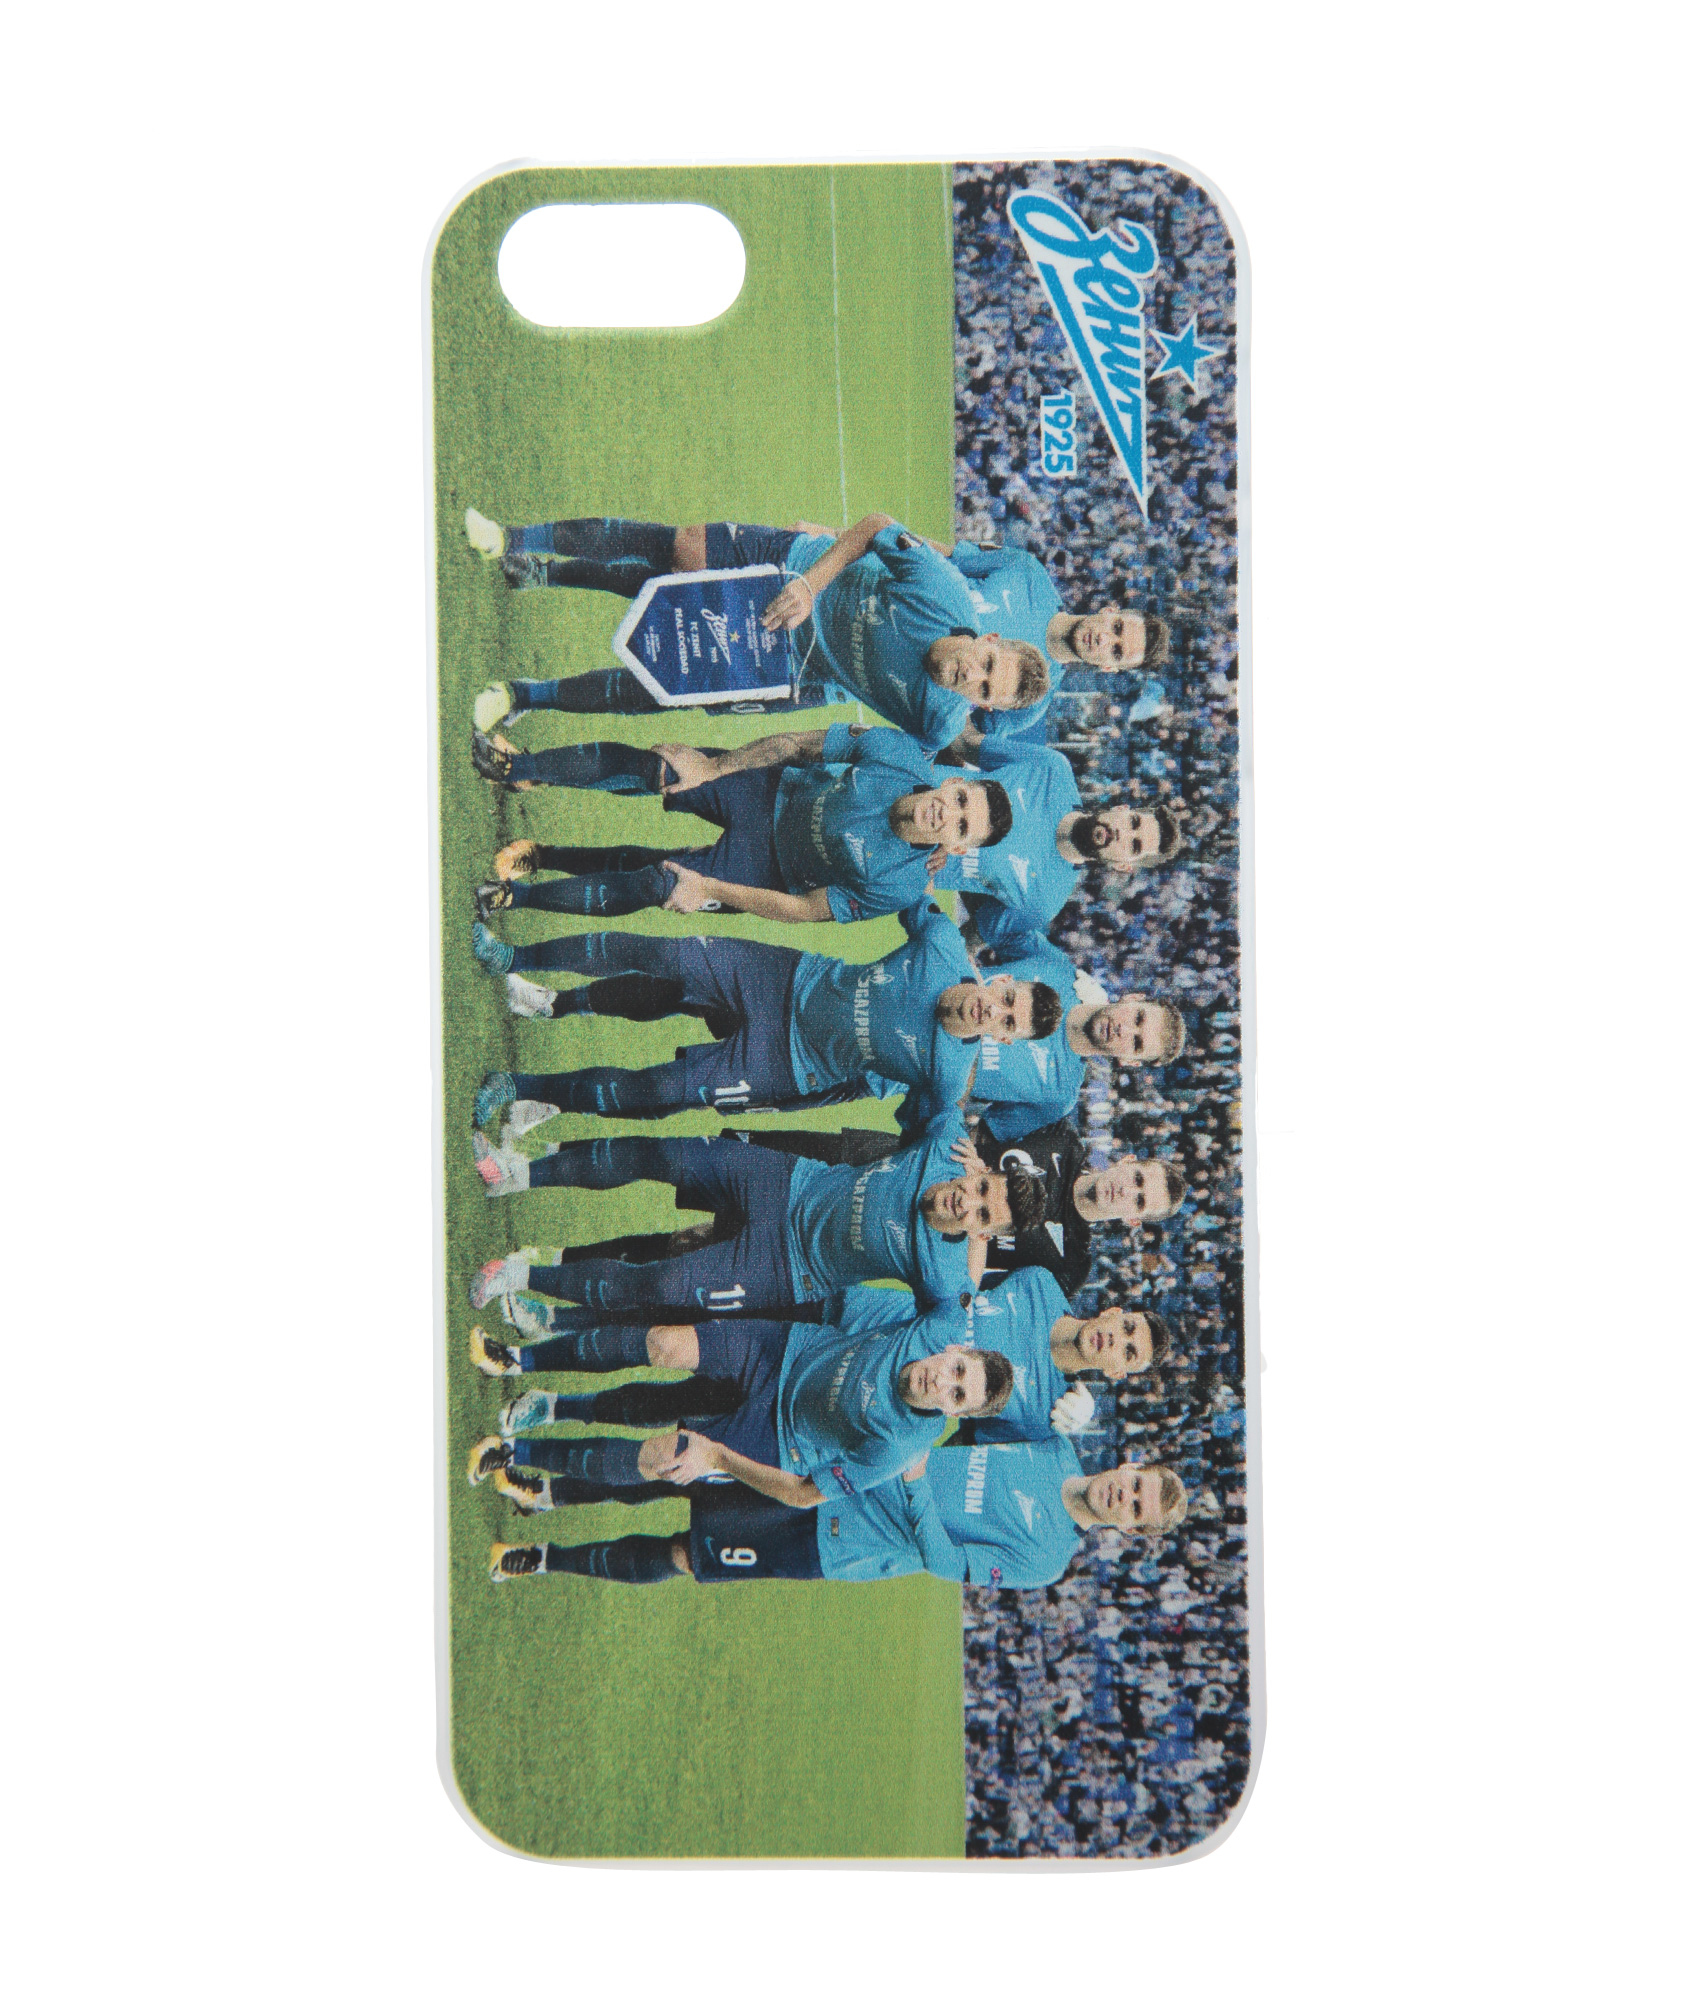 Чехол для IPhone 5/5S/SE «Команда 2017» Зенит чехол для iphone 5 5s se artske air soft ac ube ip5s blue